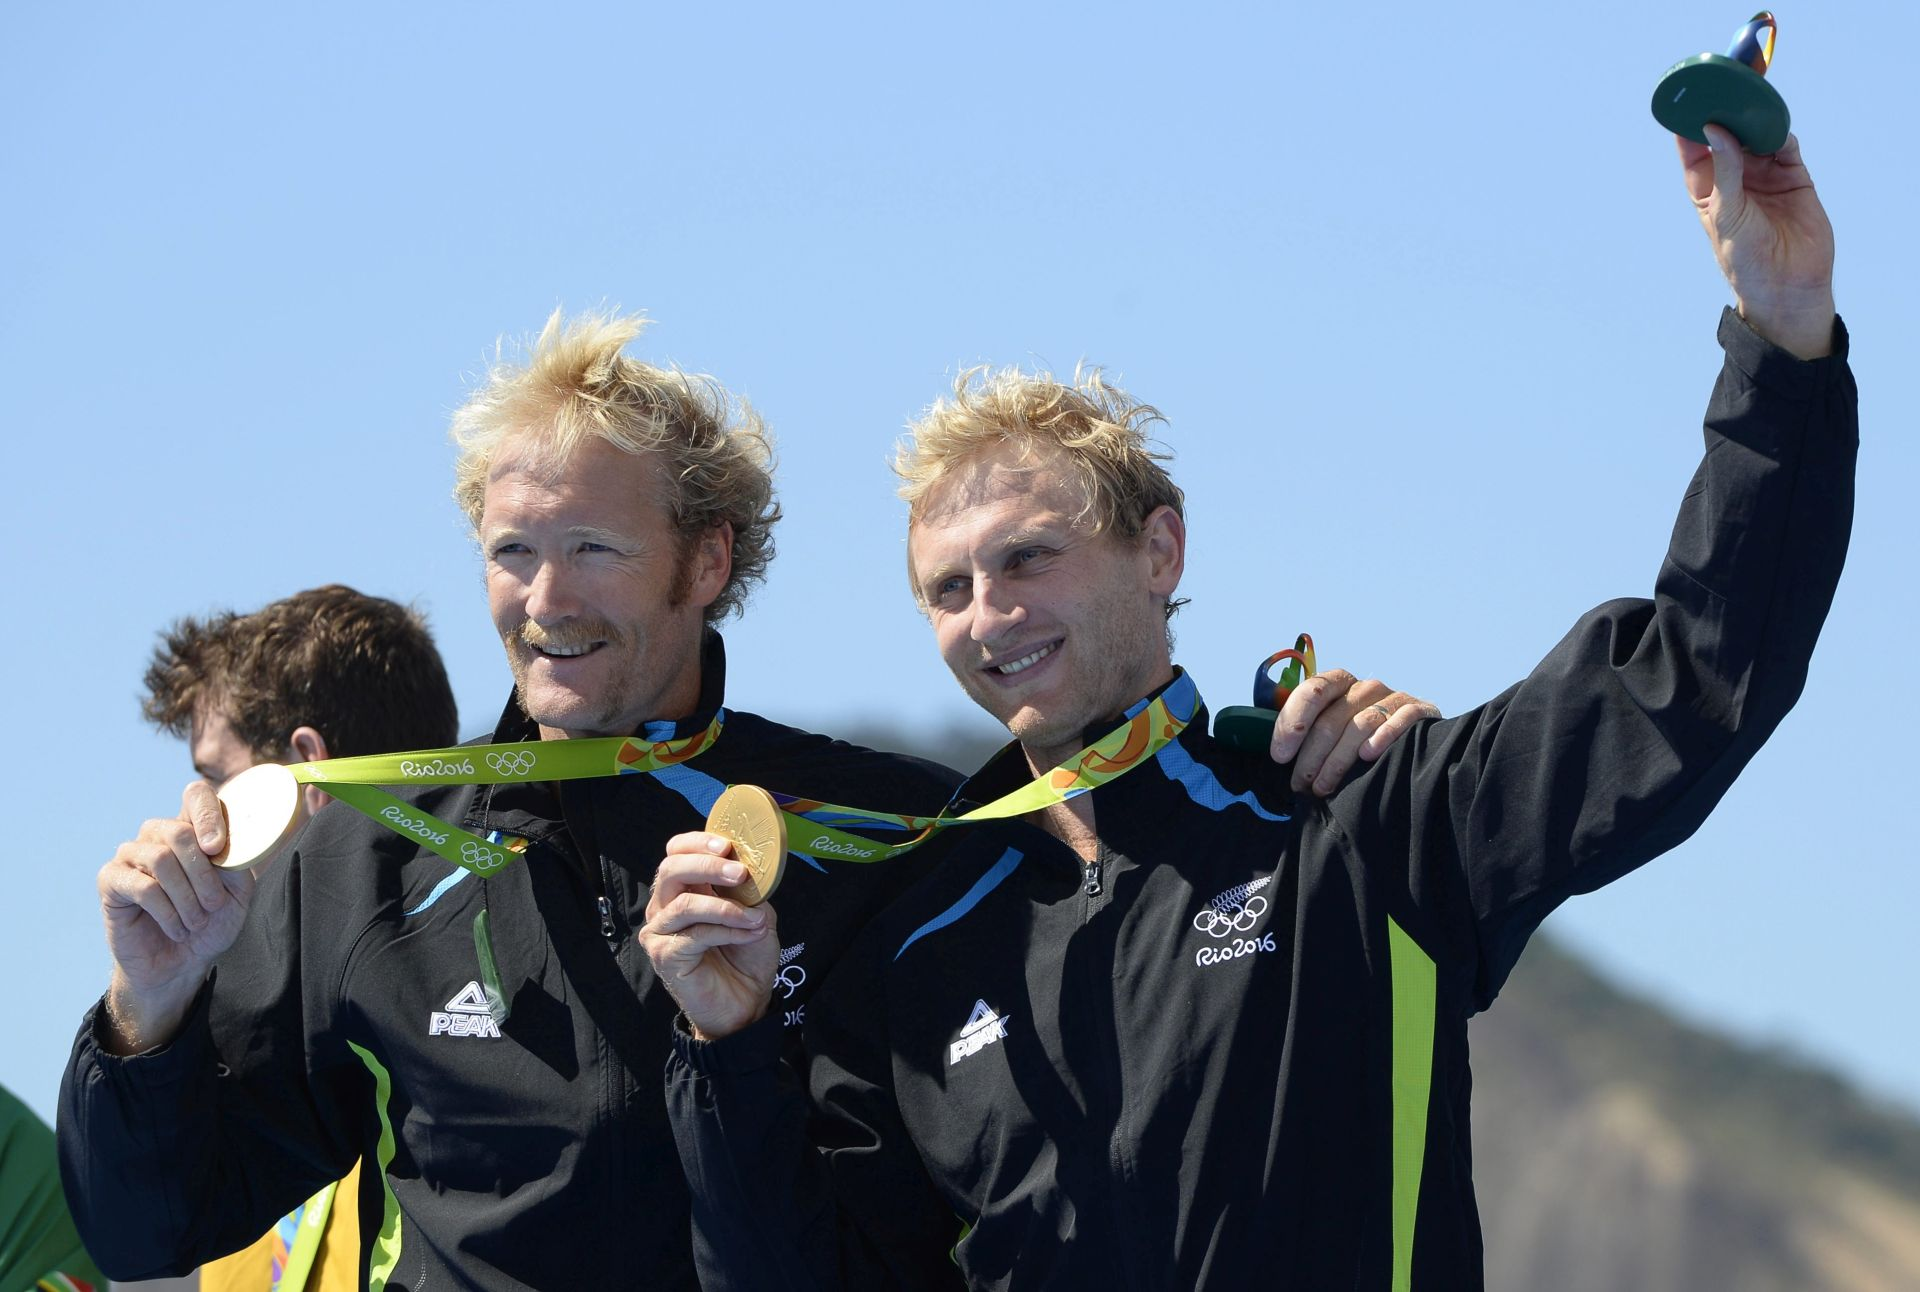 OI RIO: Novozelandski dvojac bez kormilara ostvario 69. uzastopnu pobjedu